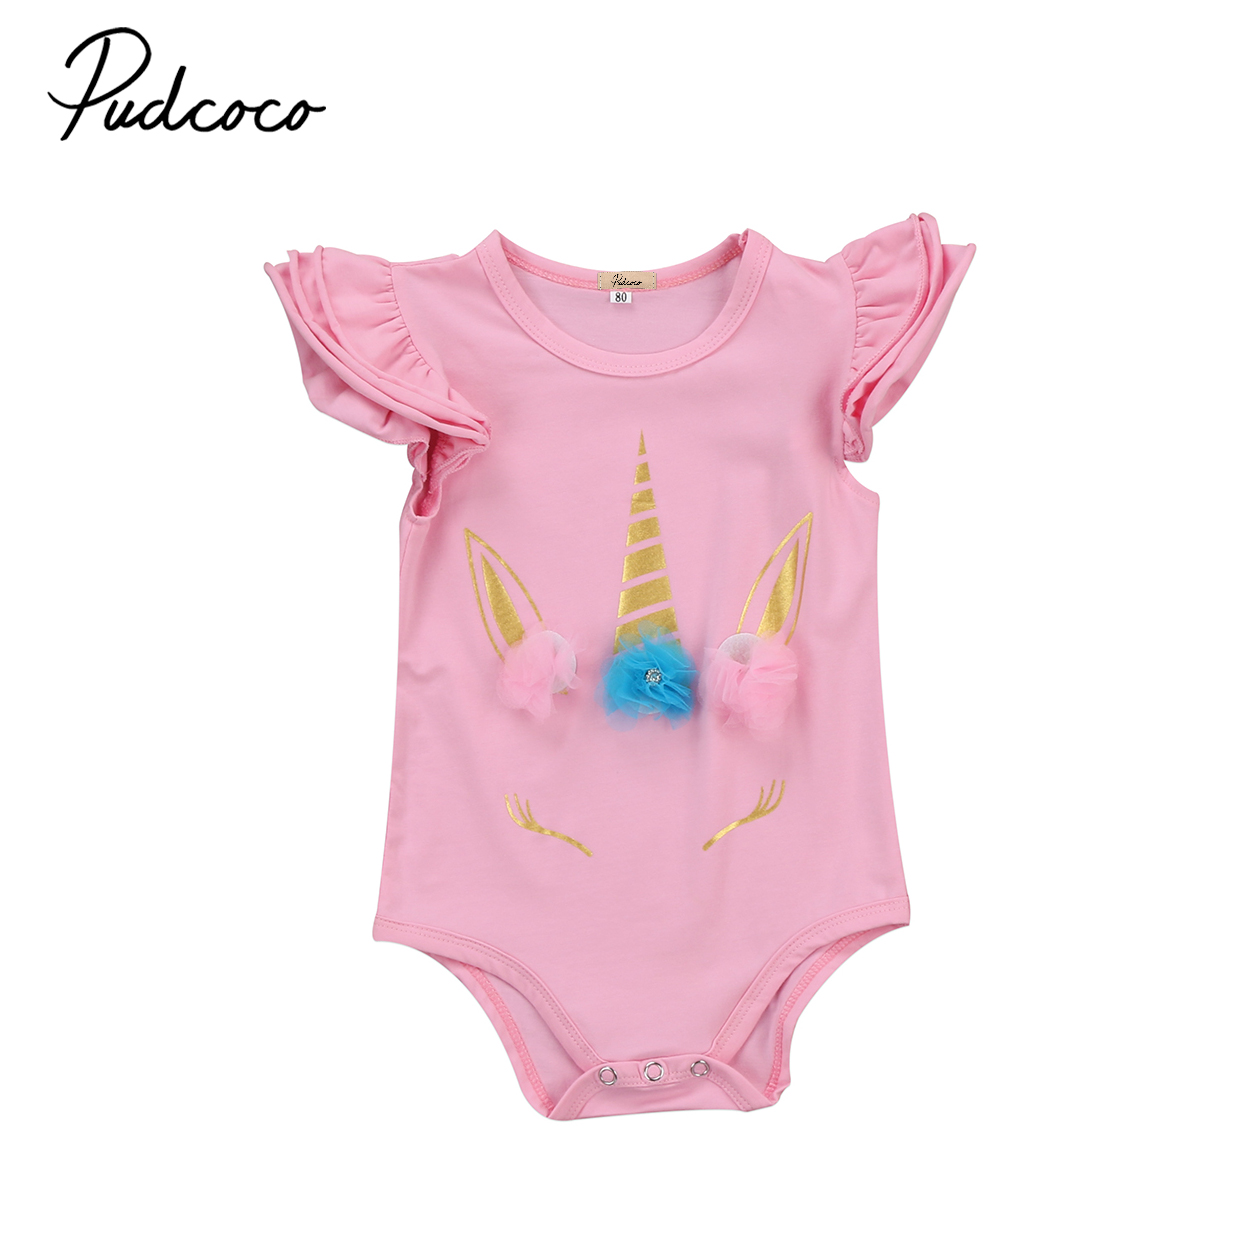 Baby unicorn Bodysuit Clothing New Newborn Baby Boy Girl Ruffles Bodysuits Clothes Infant Cotton Playsuitsuits Cartoon